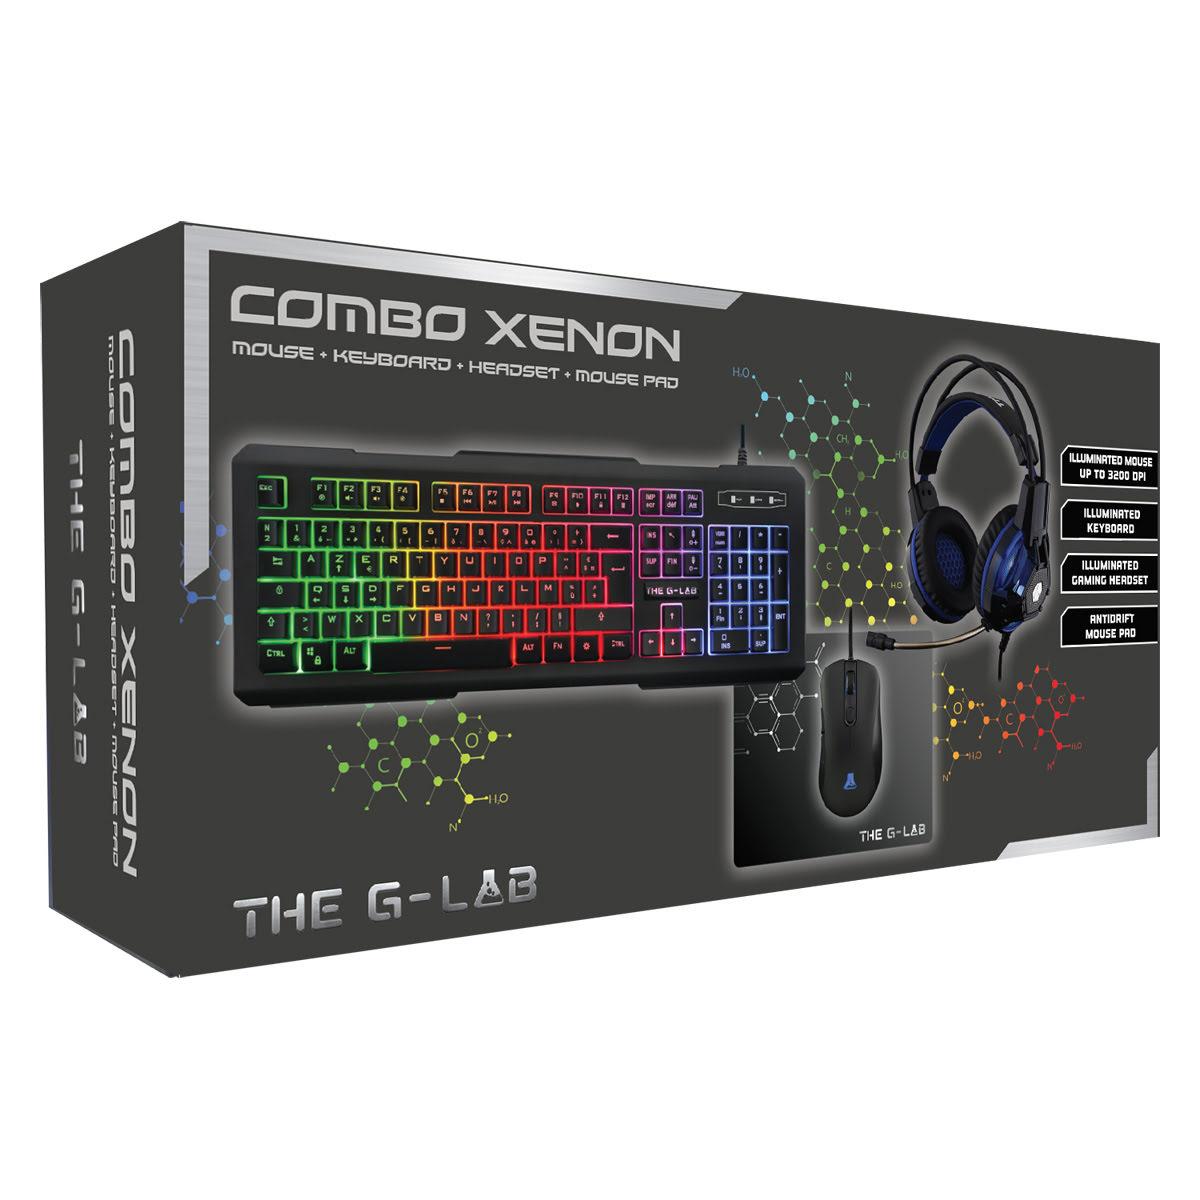 The G-LAB Gaming Combo XENON - Pack Clavier/Souris - Cybertek.fr - 1